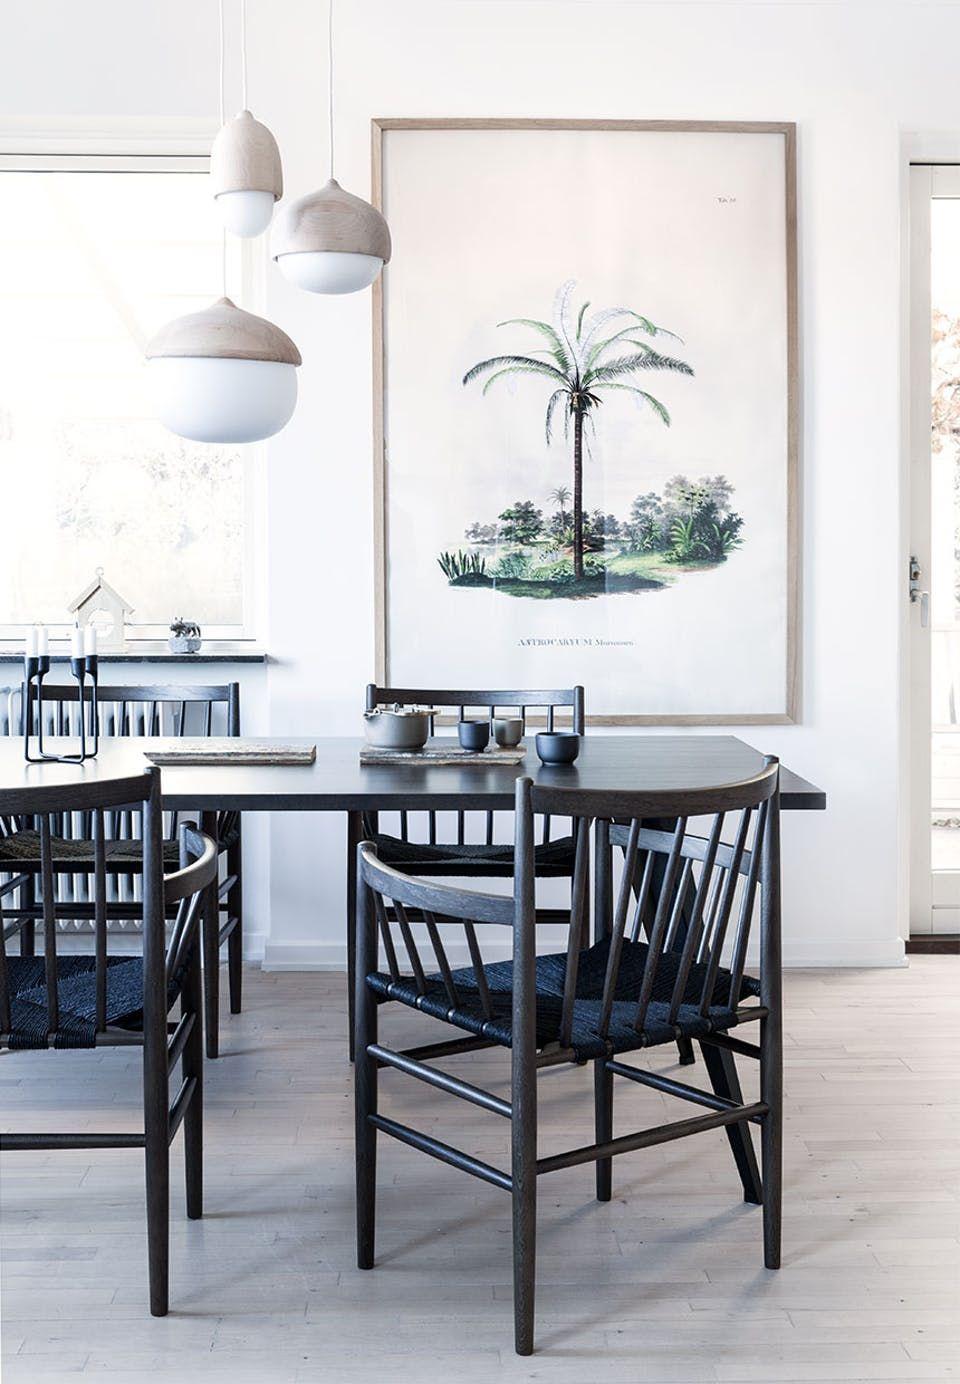 designchefens smukke villa fra 1930 erne things i love esszimmer rh pinterest at